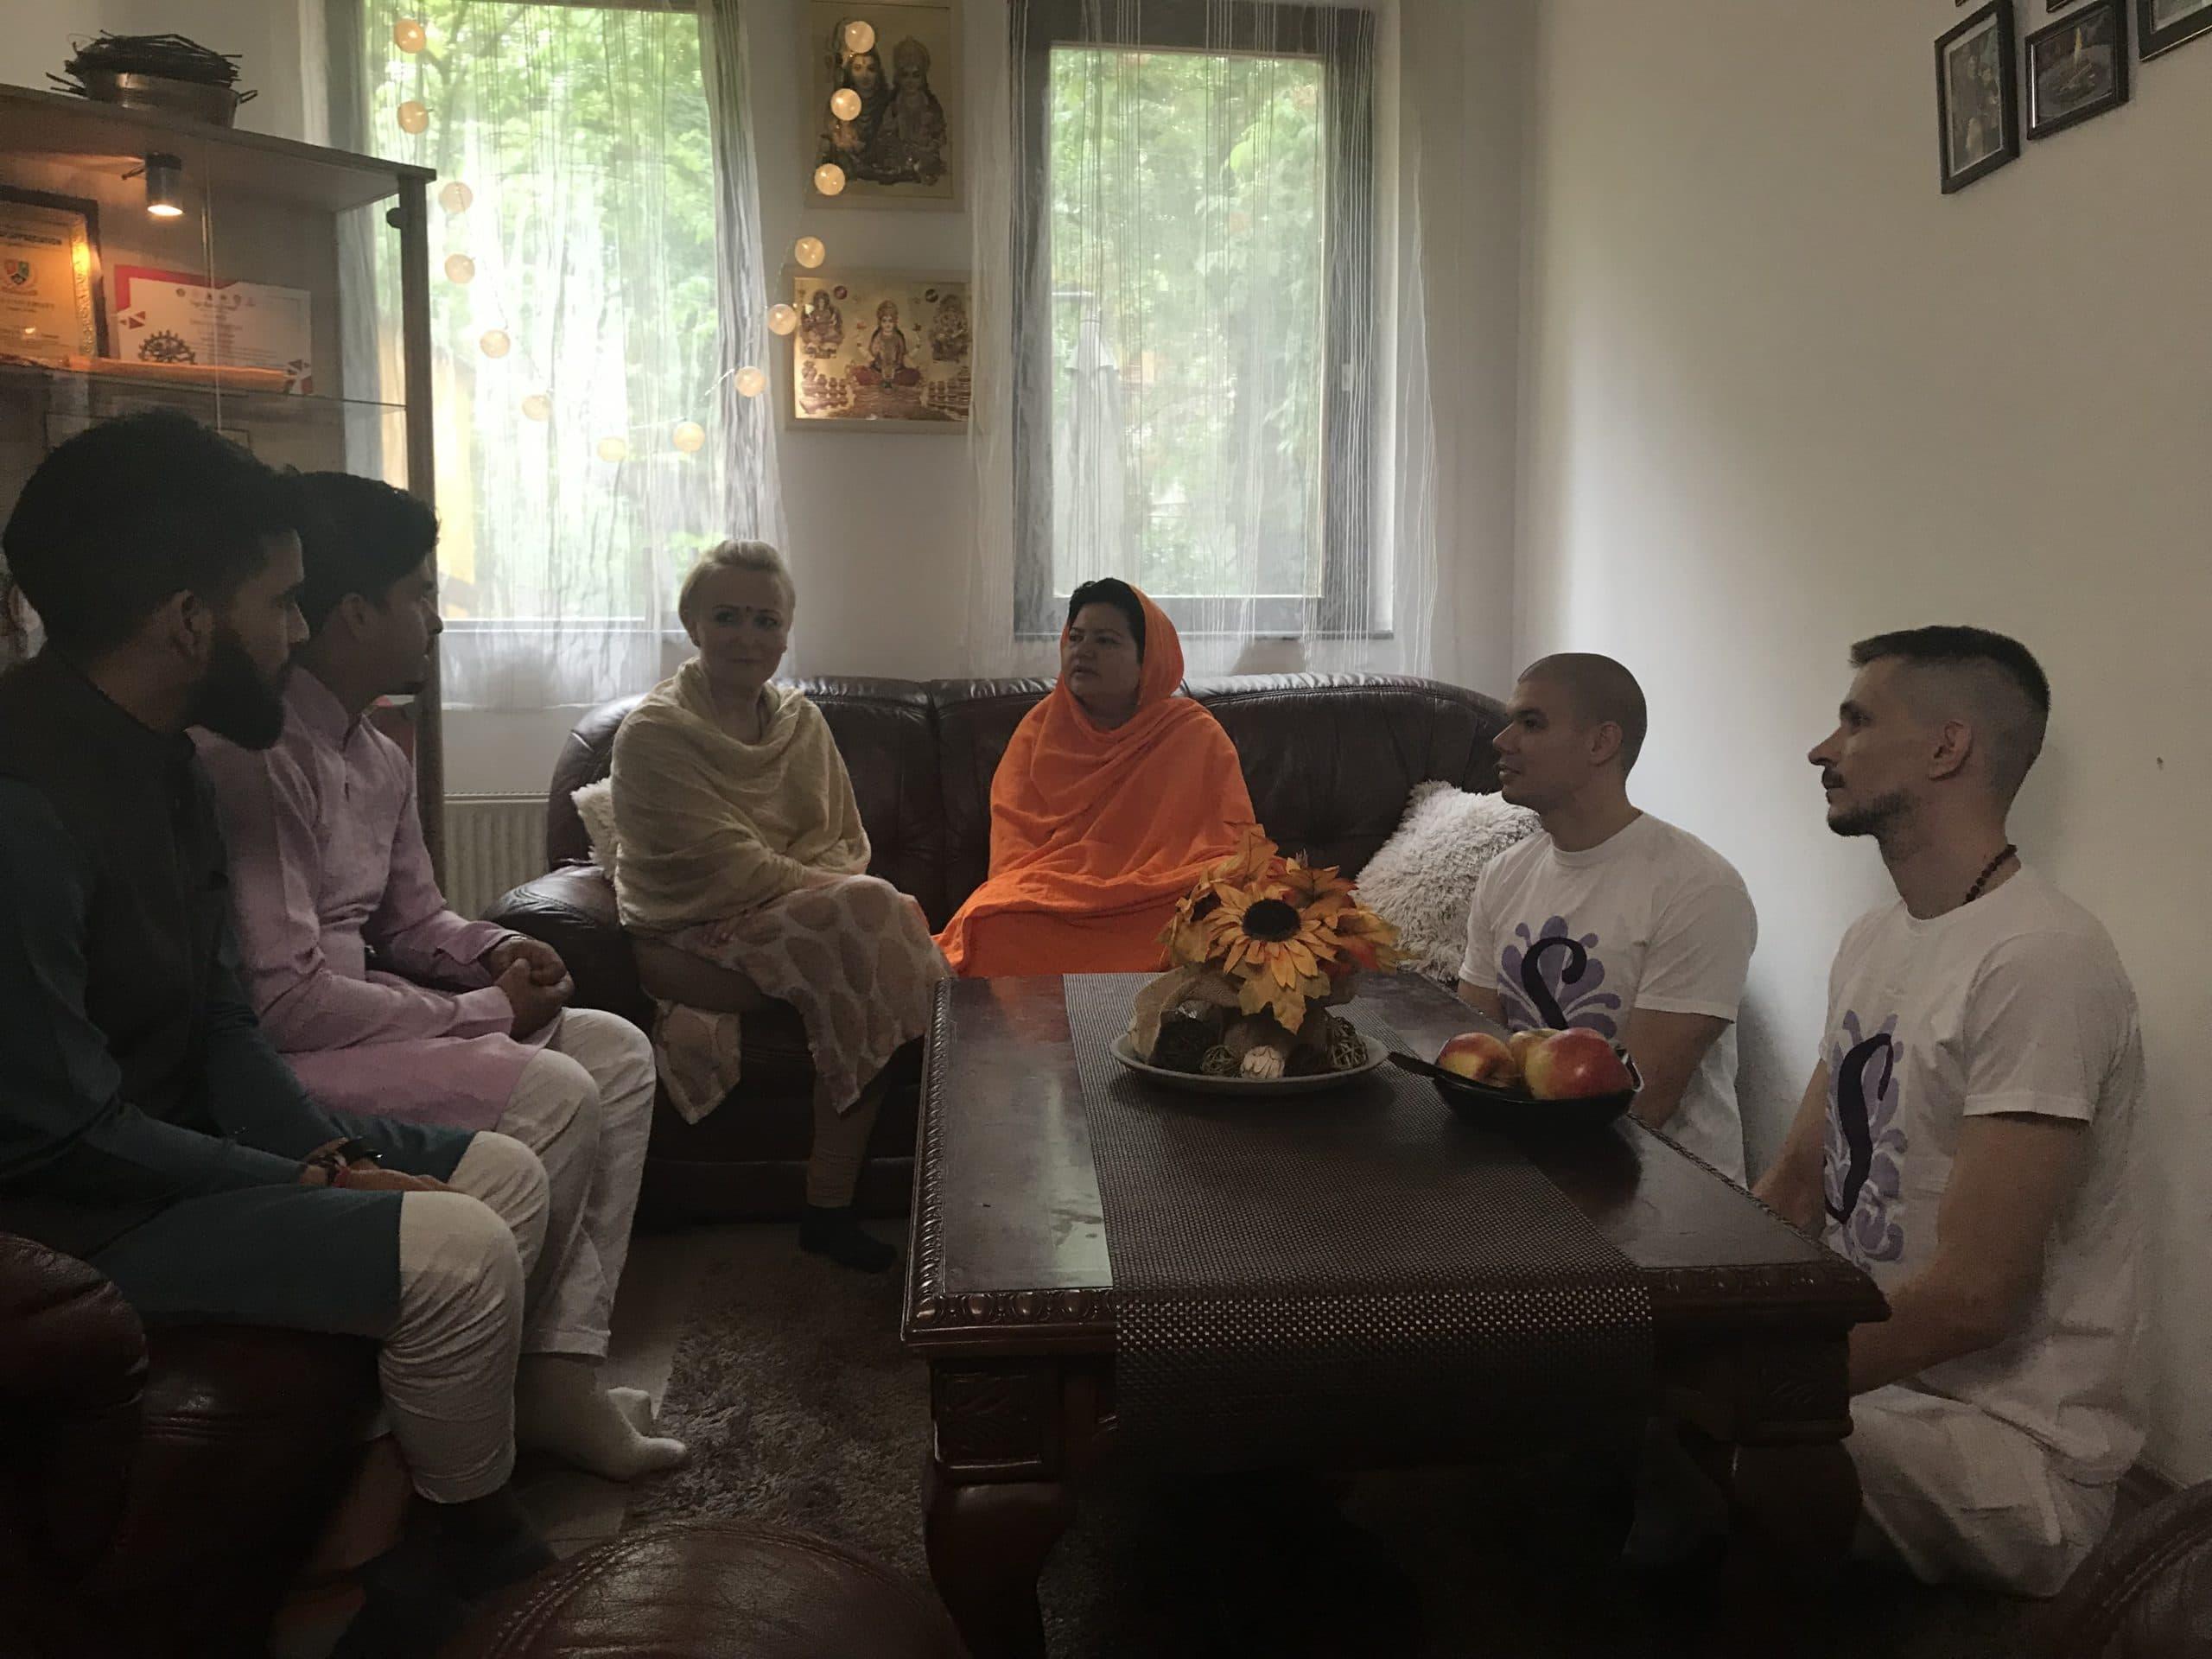 Őszentsége Sadhvi Shankaracharya Hemanand Giriji közösségünk vendége